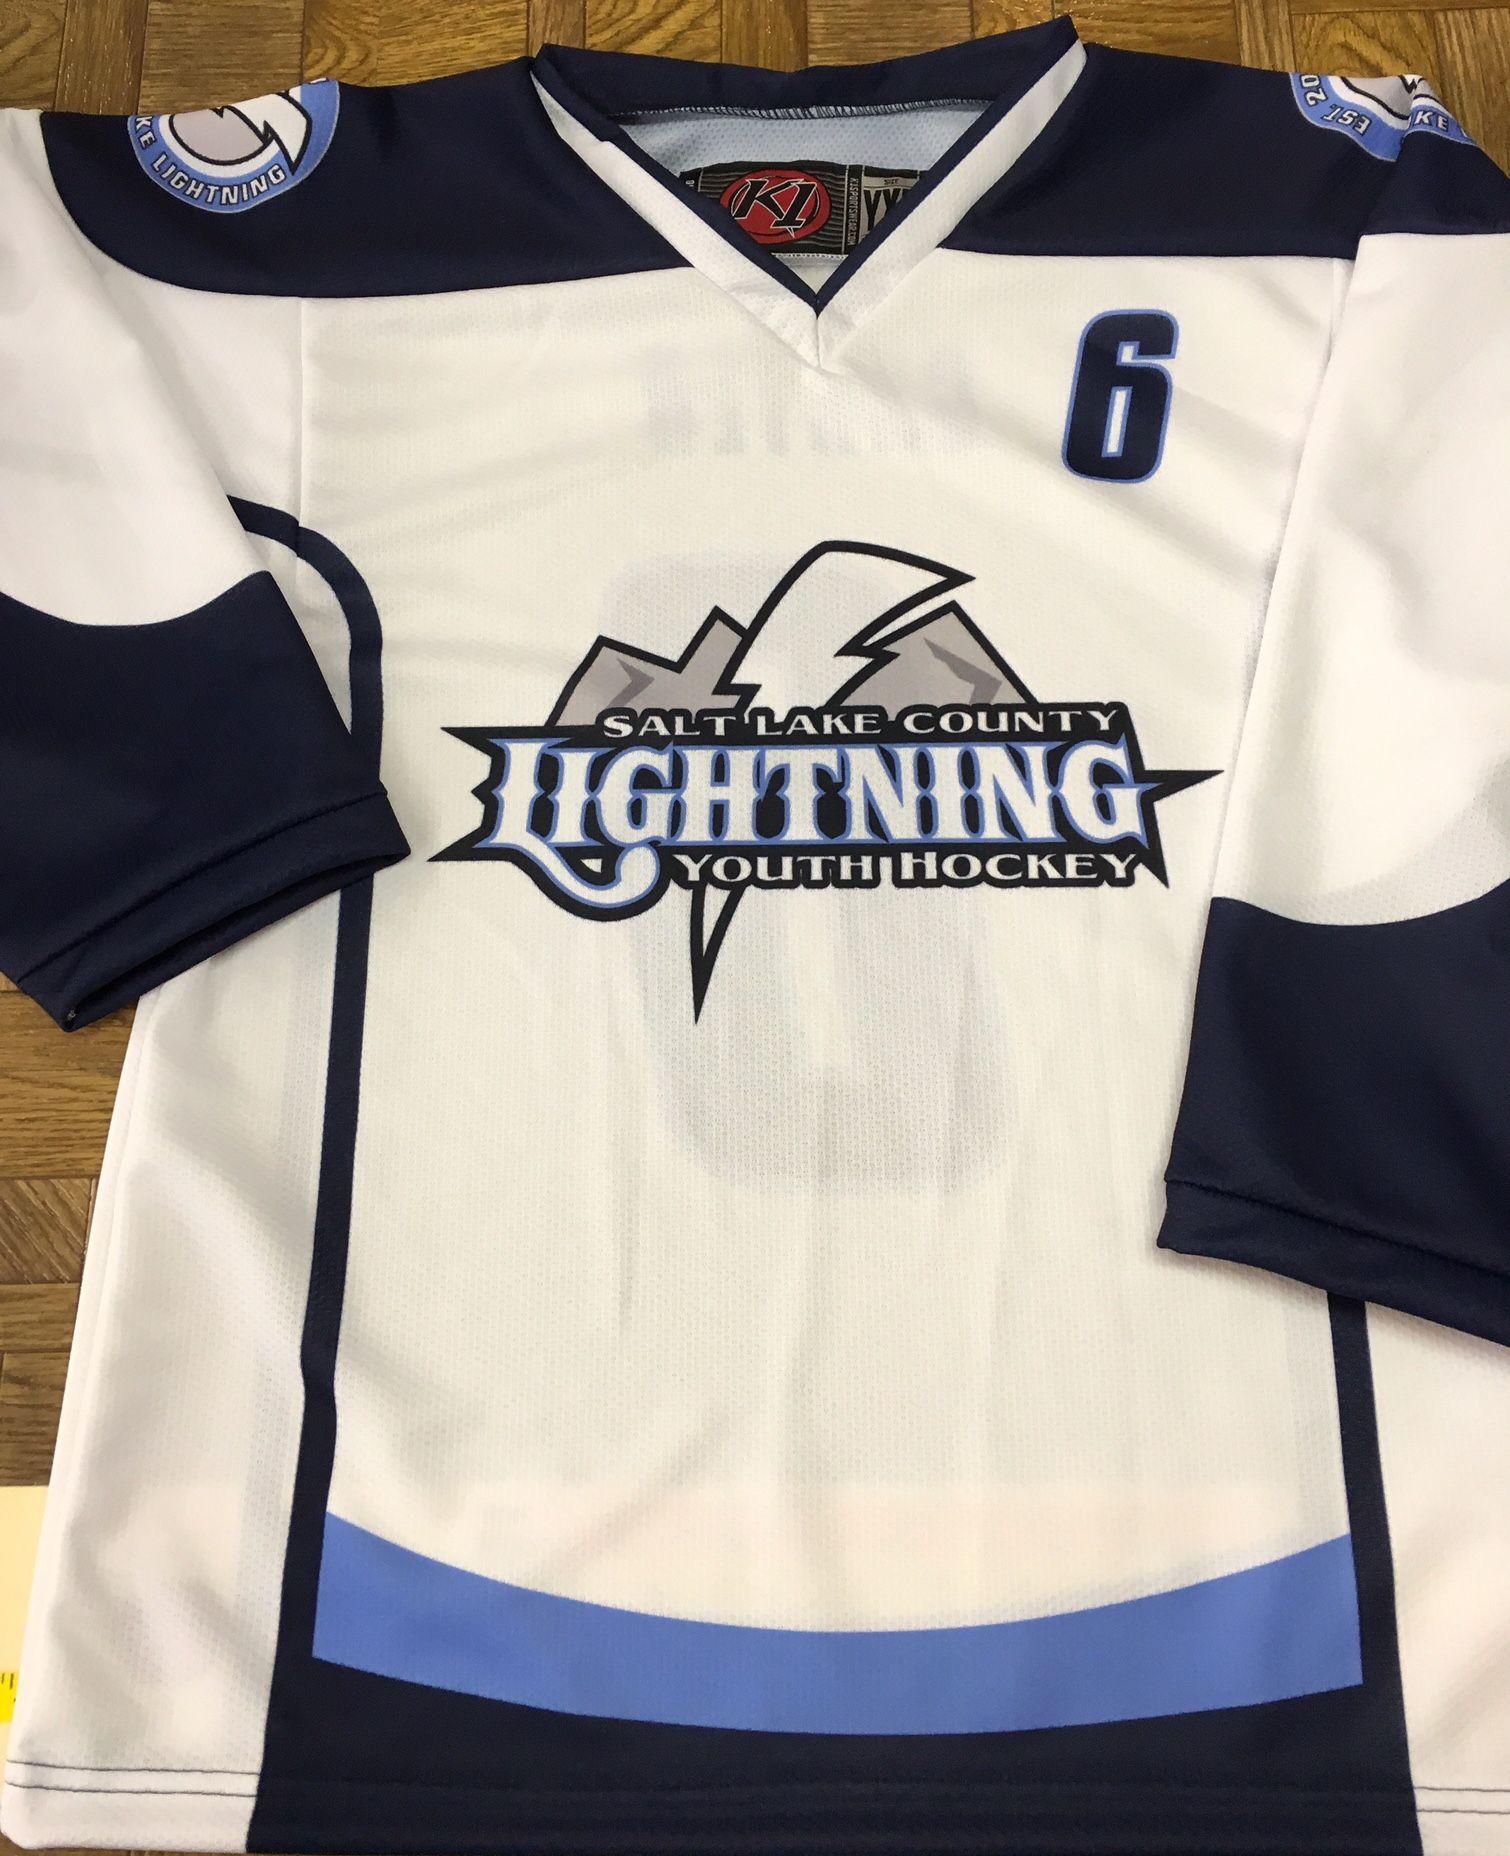 Salt Lake County Lightning custom sublimated hockey jerseys. Made in the USA f95eb77727997